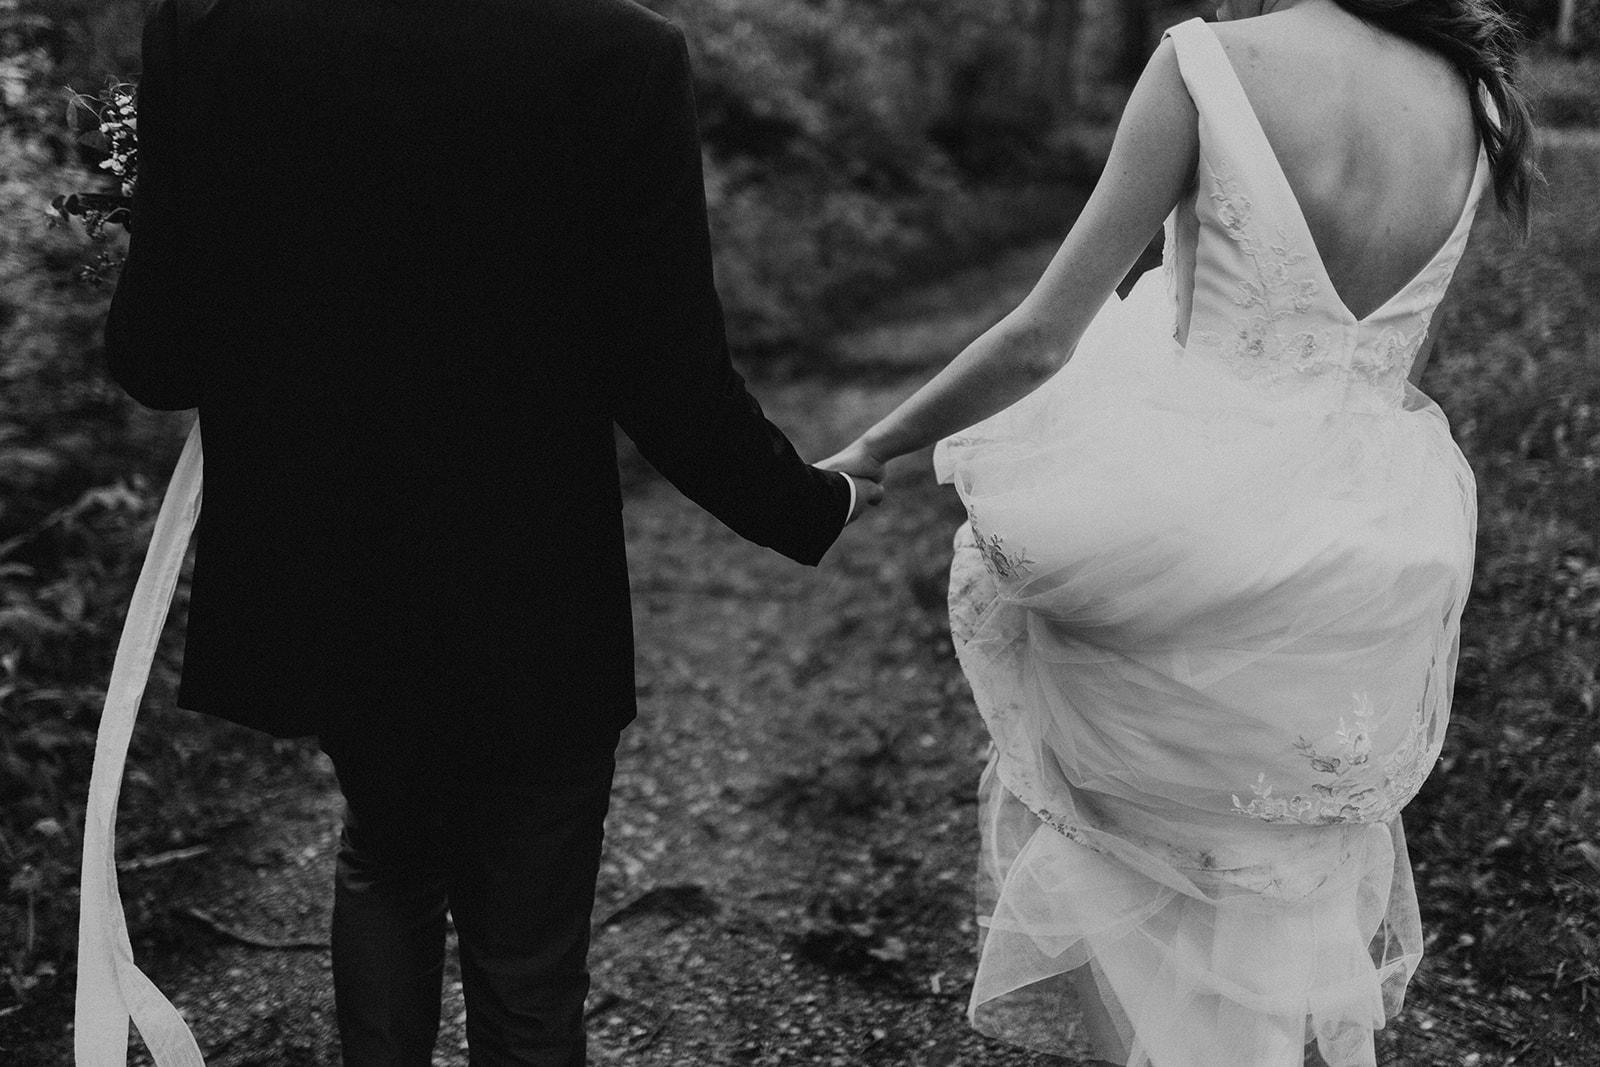 camp_wokanda_peoria_illinois_wedding_photographer_wright_photographs_bliese_0832.jpg